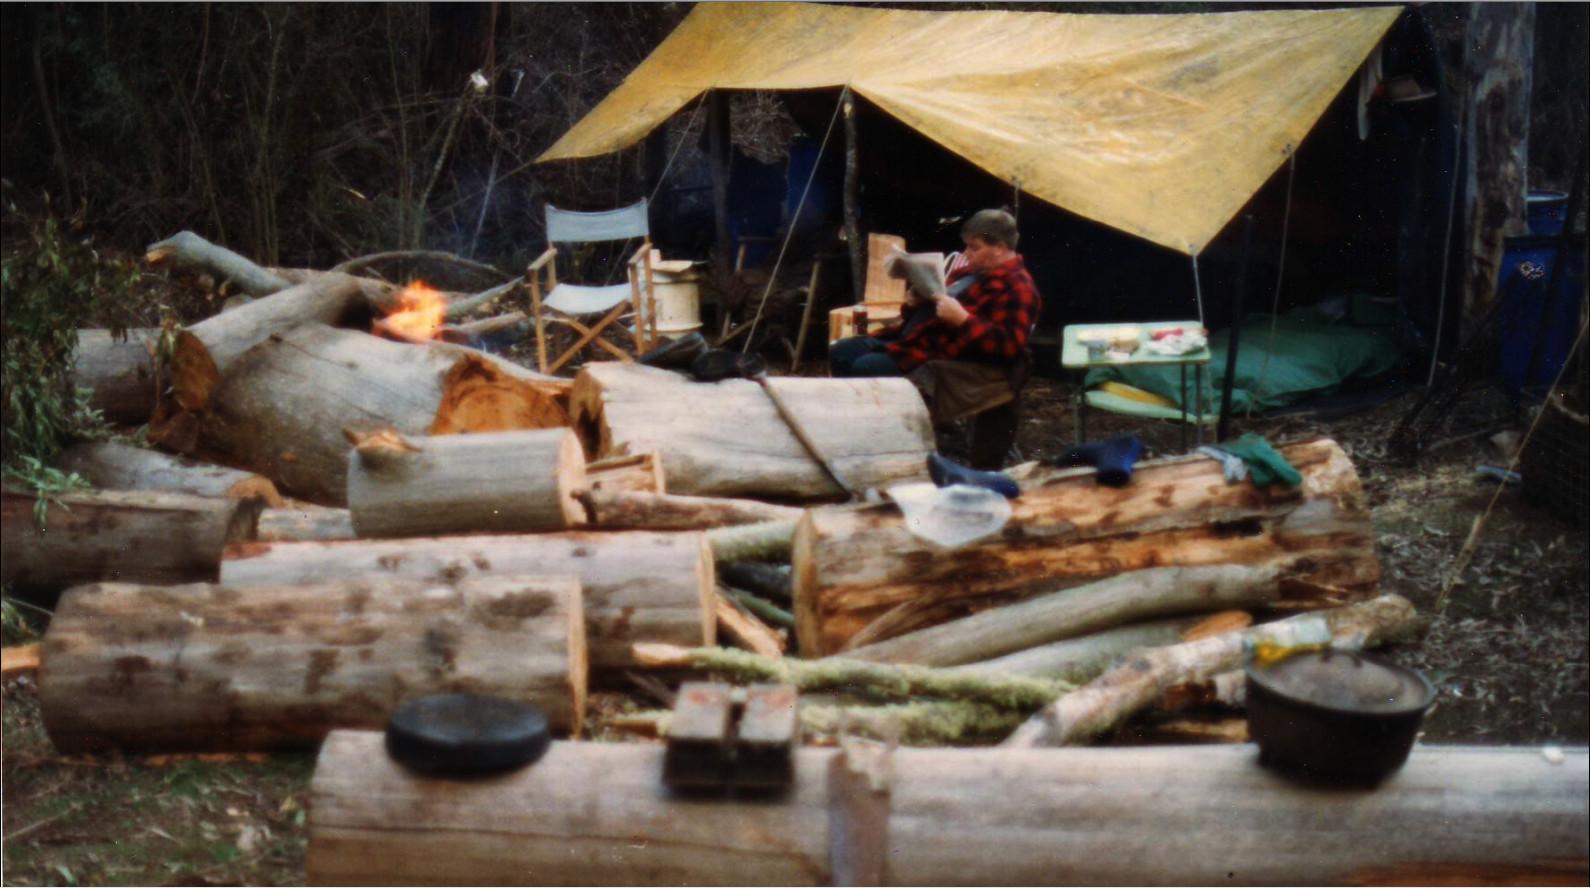 camp wood supply.jpg